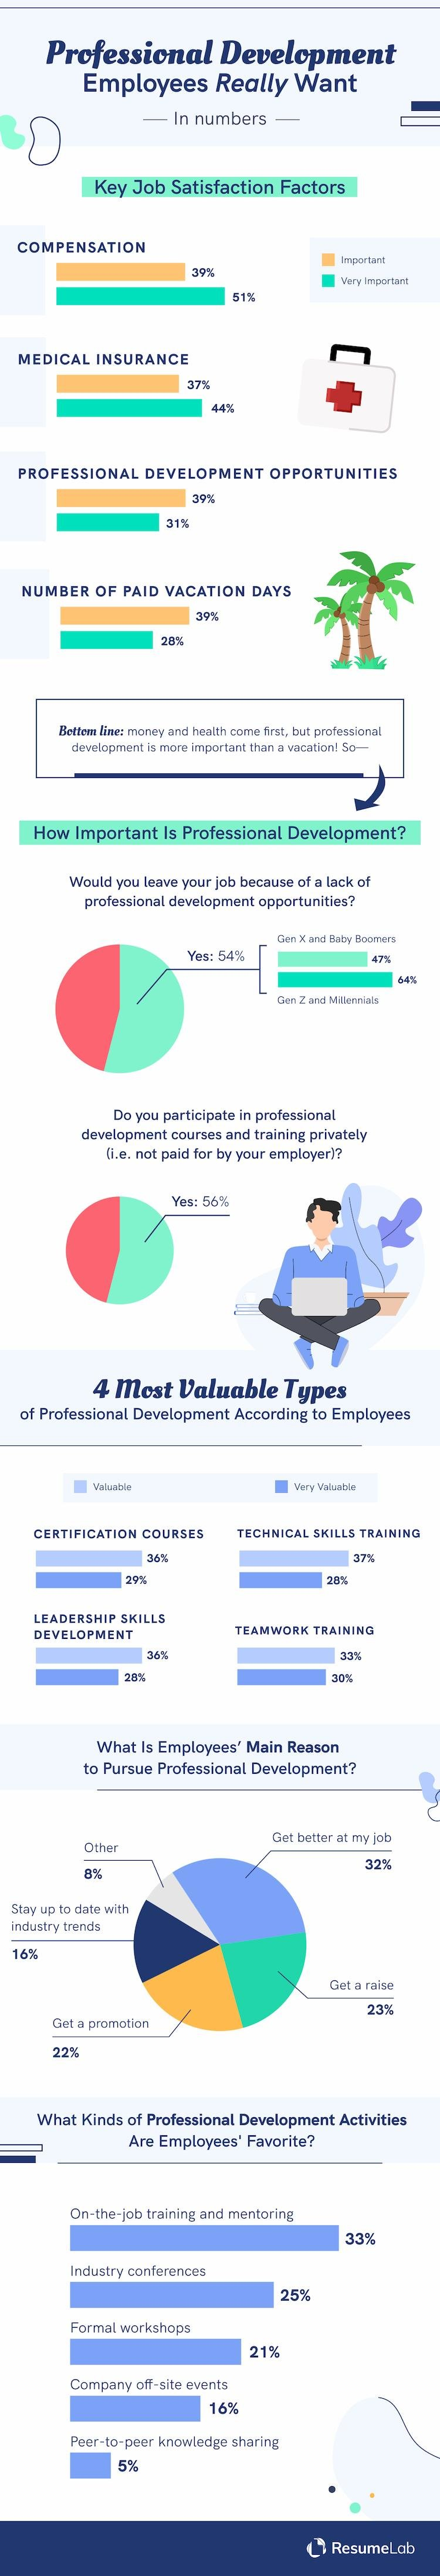 Professional development employees want most